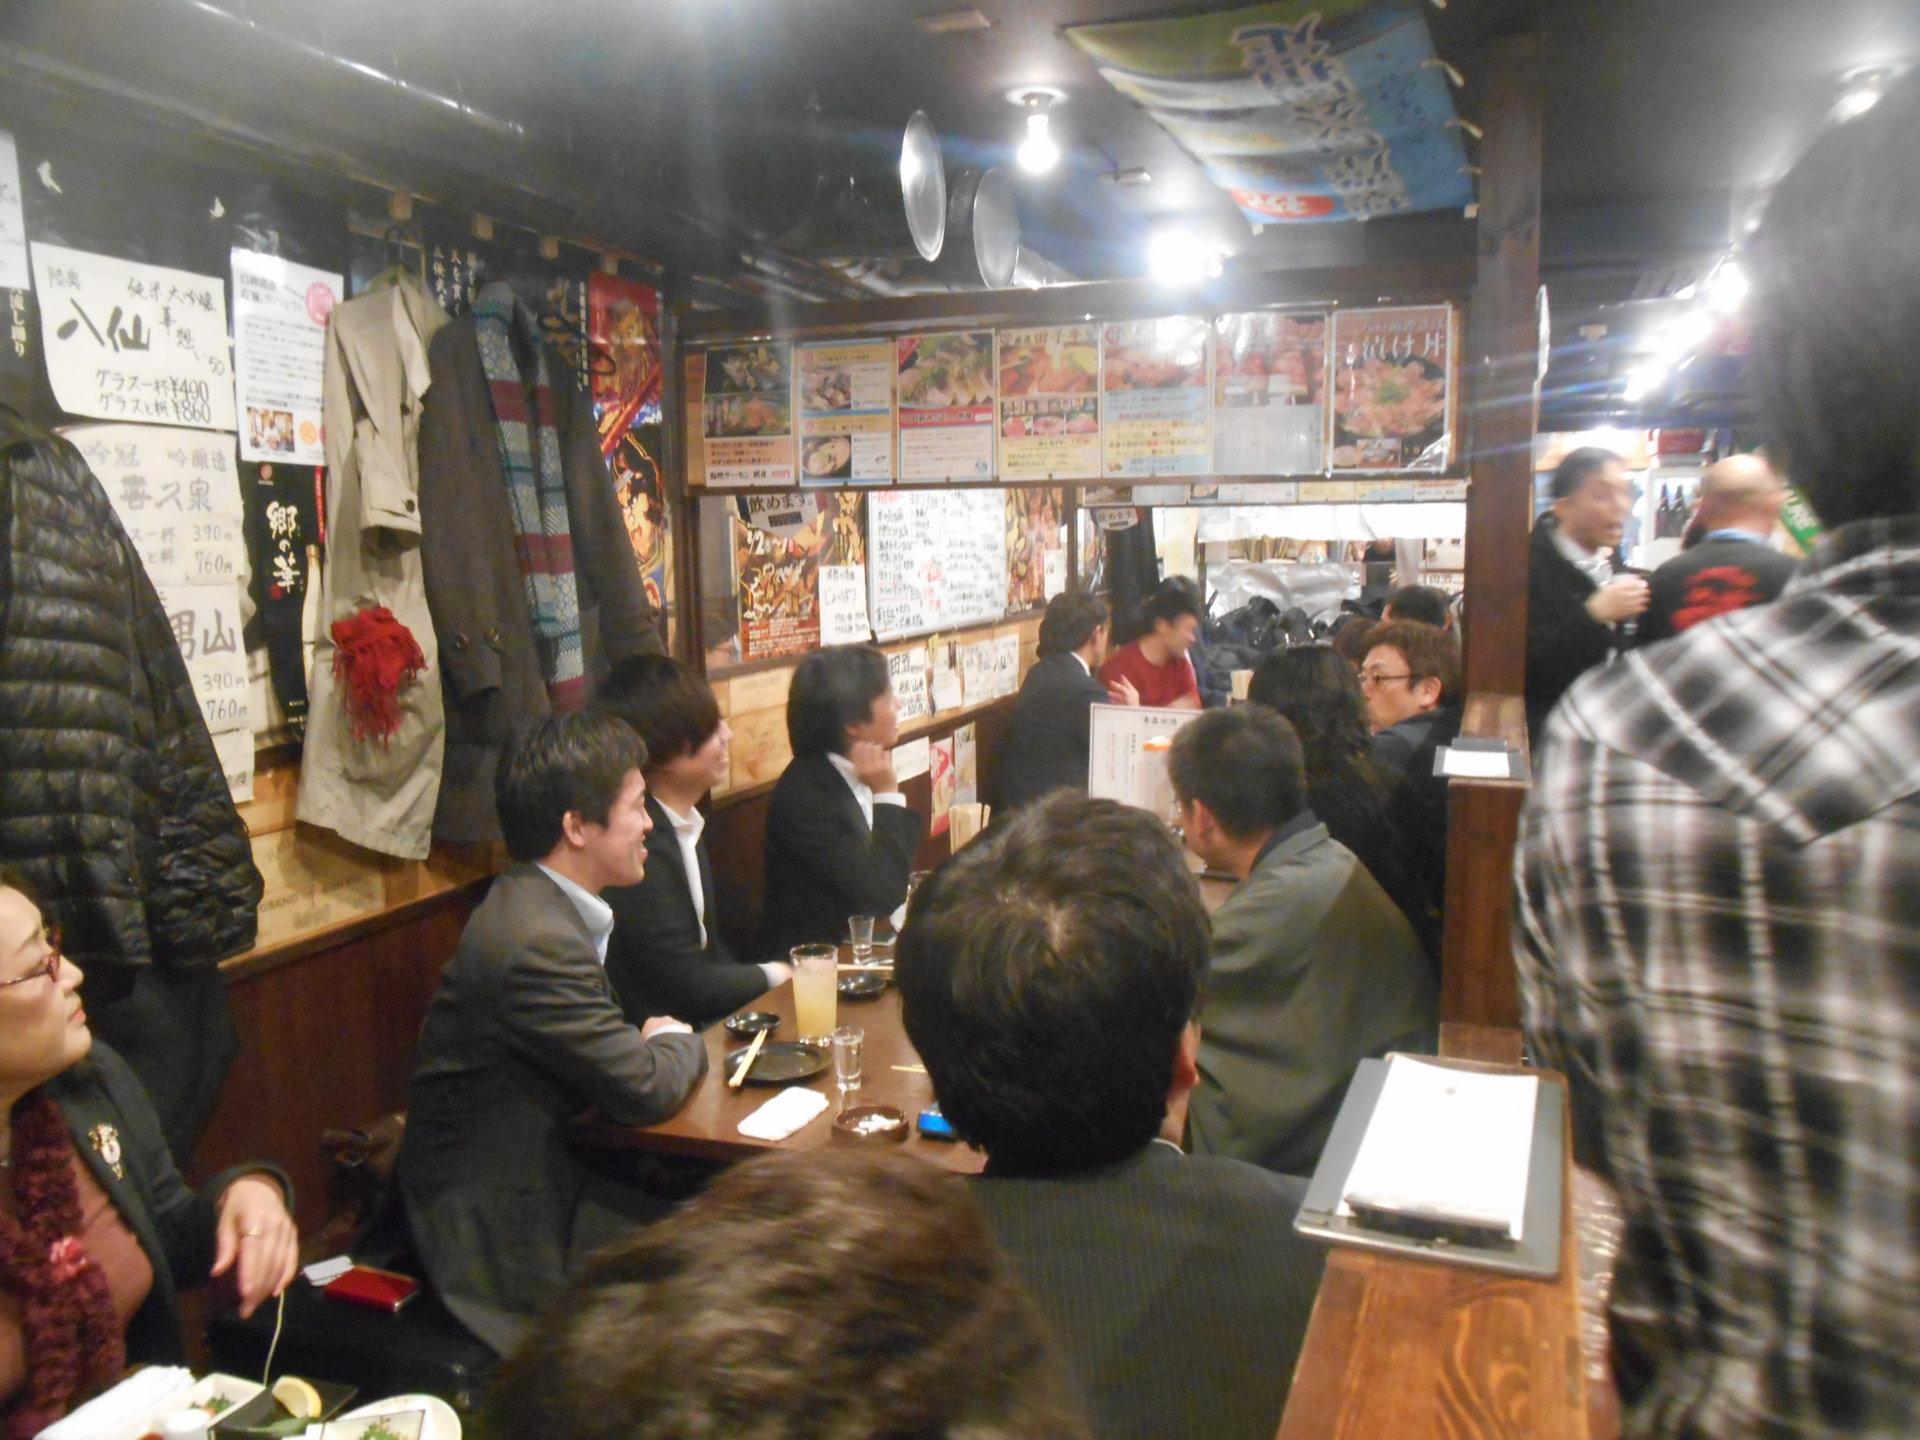 DSCN0612 1920x1440 - 2015年12月21日(月) AOsuki忘年会開催しました。